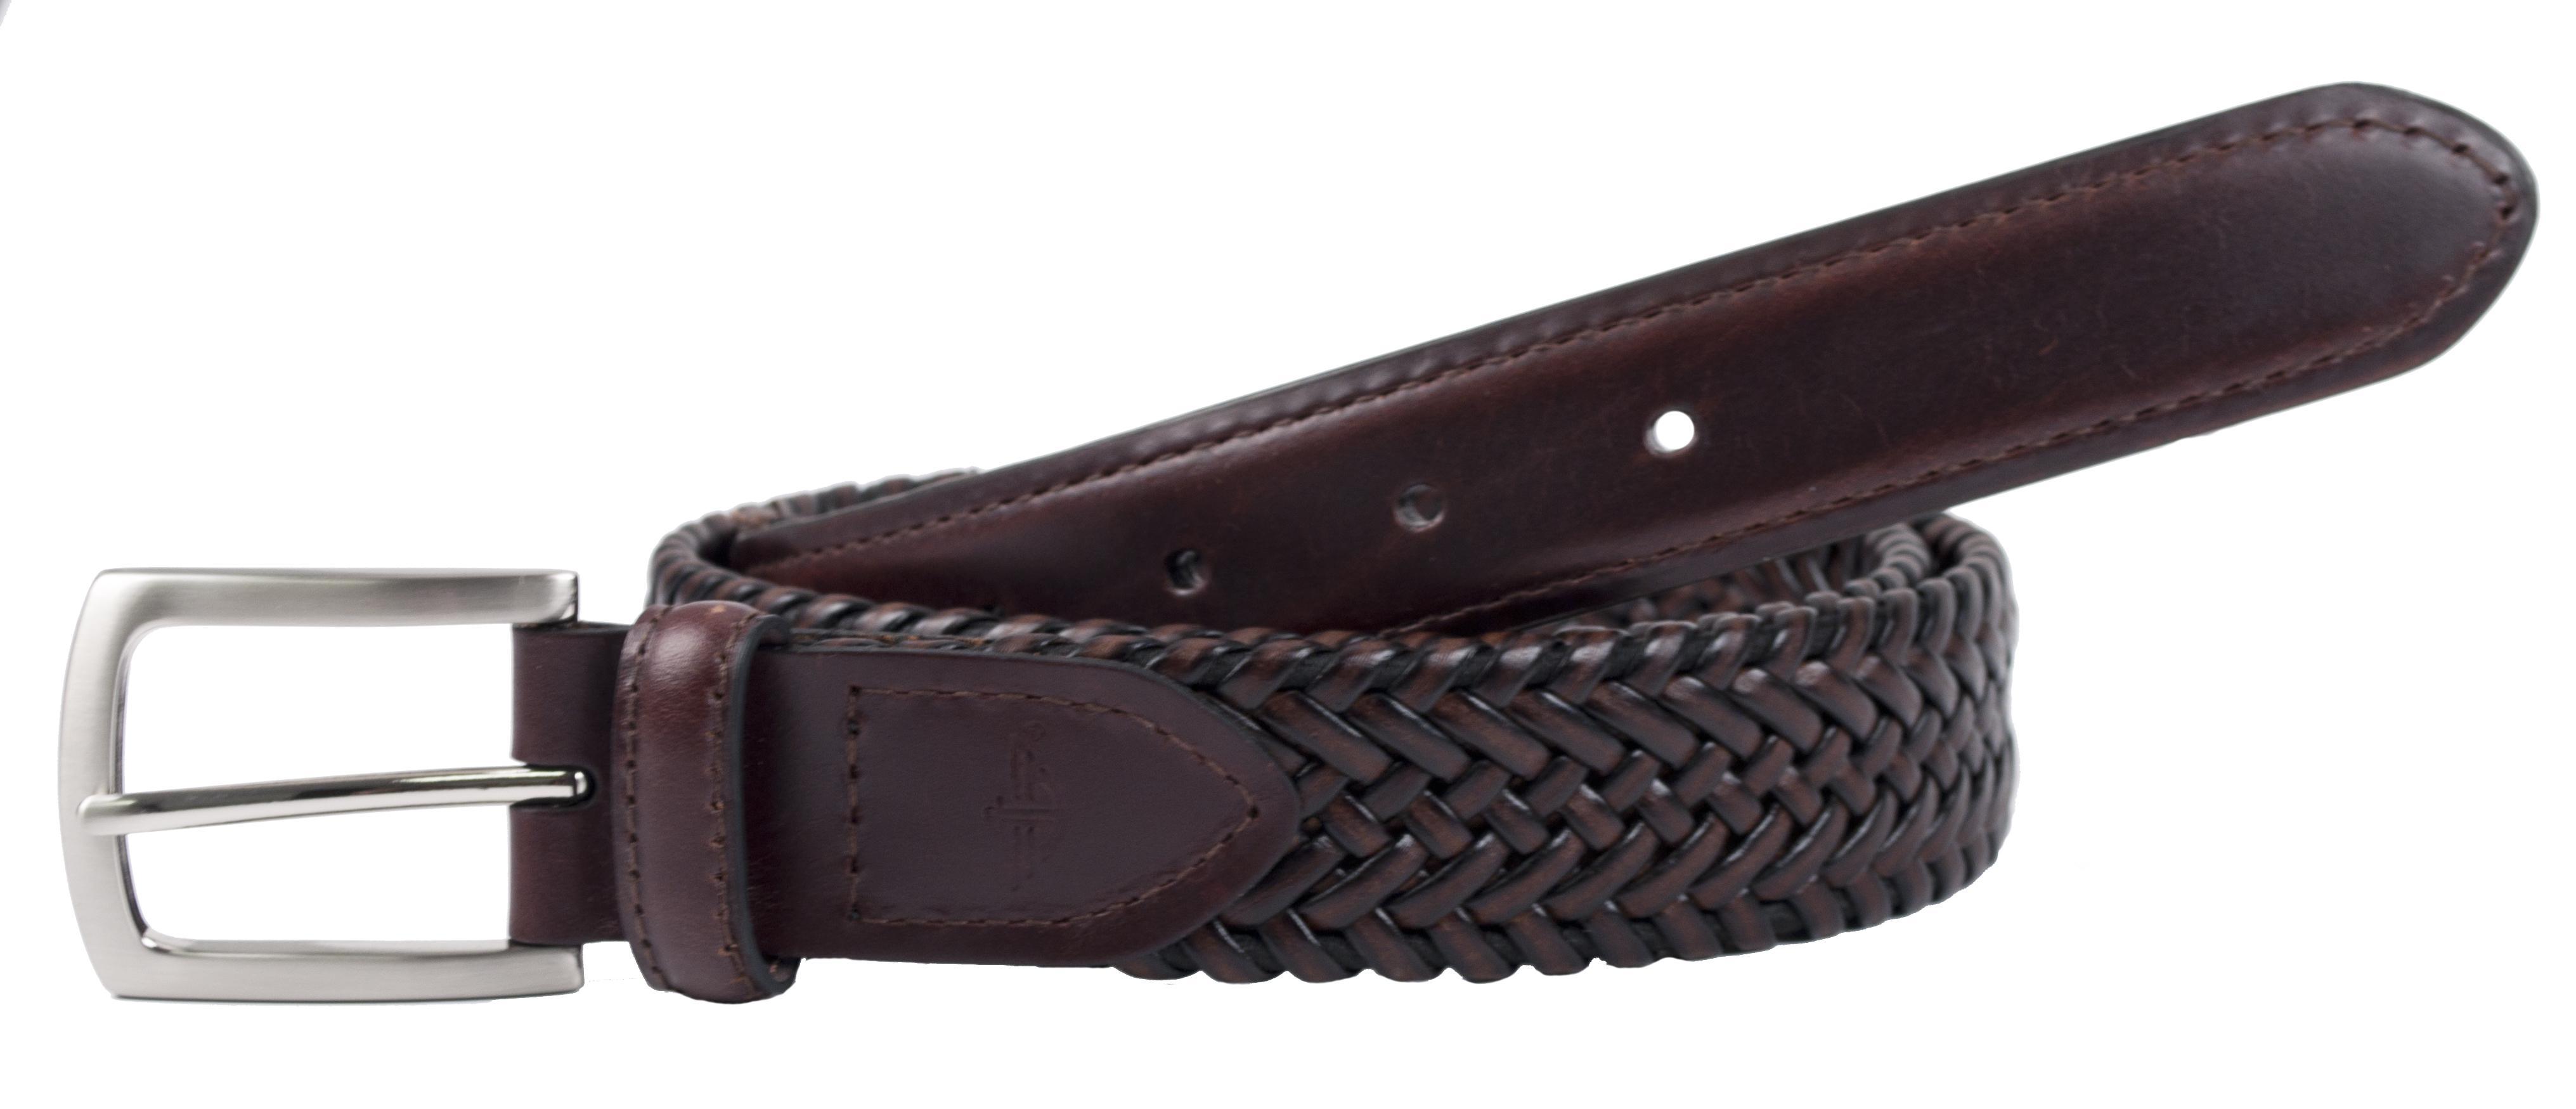 Dockers Men's Leather Tubular Stretch 1 1/4 Inch Belt